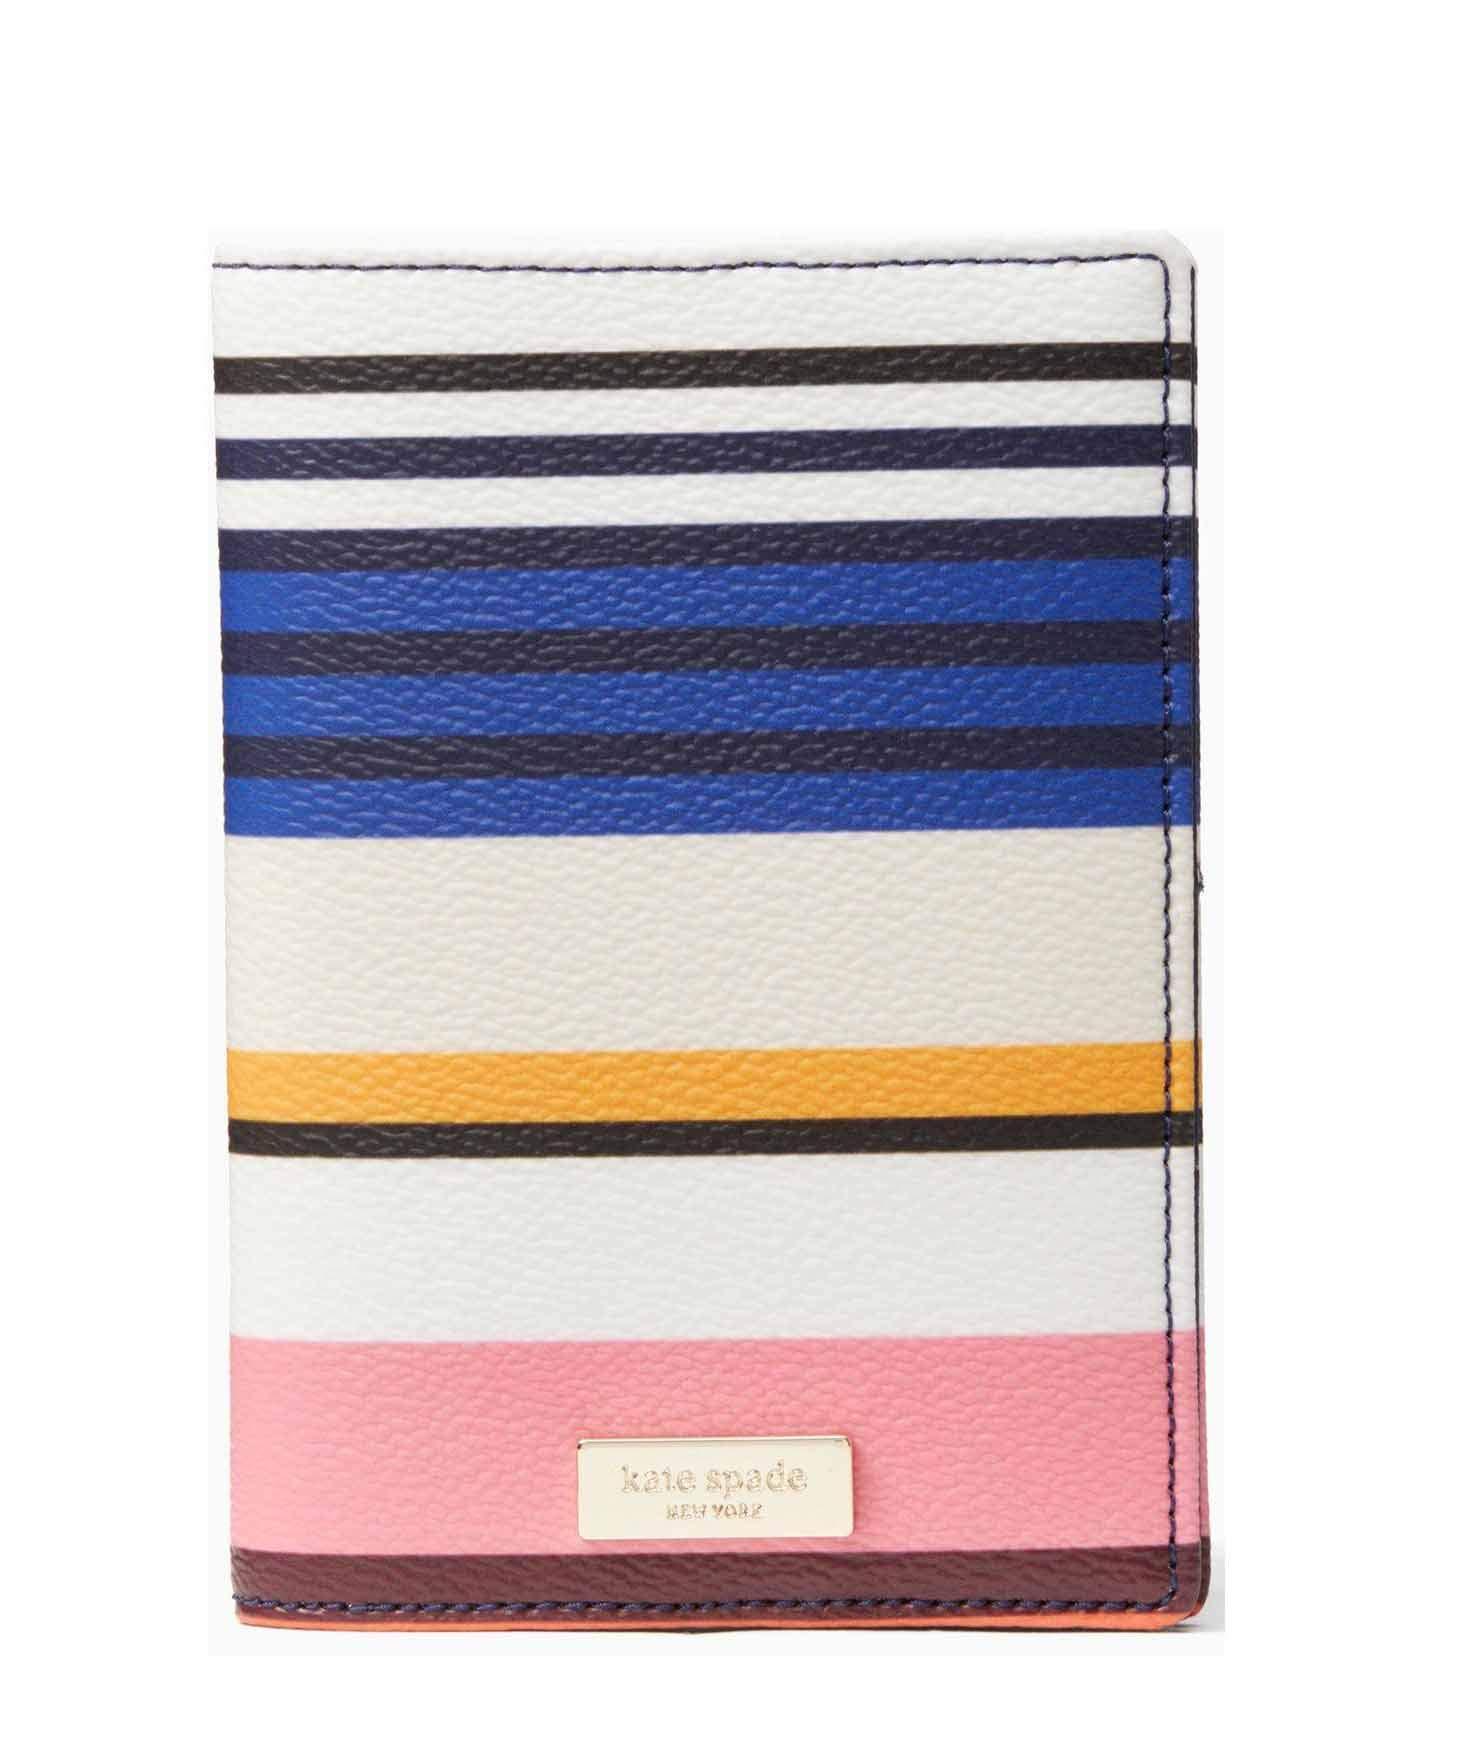 Kate Spade New York Shore Street Berber Stripe Passport Holder - Pink Multi